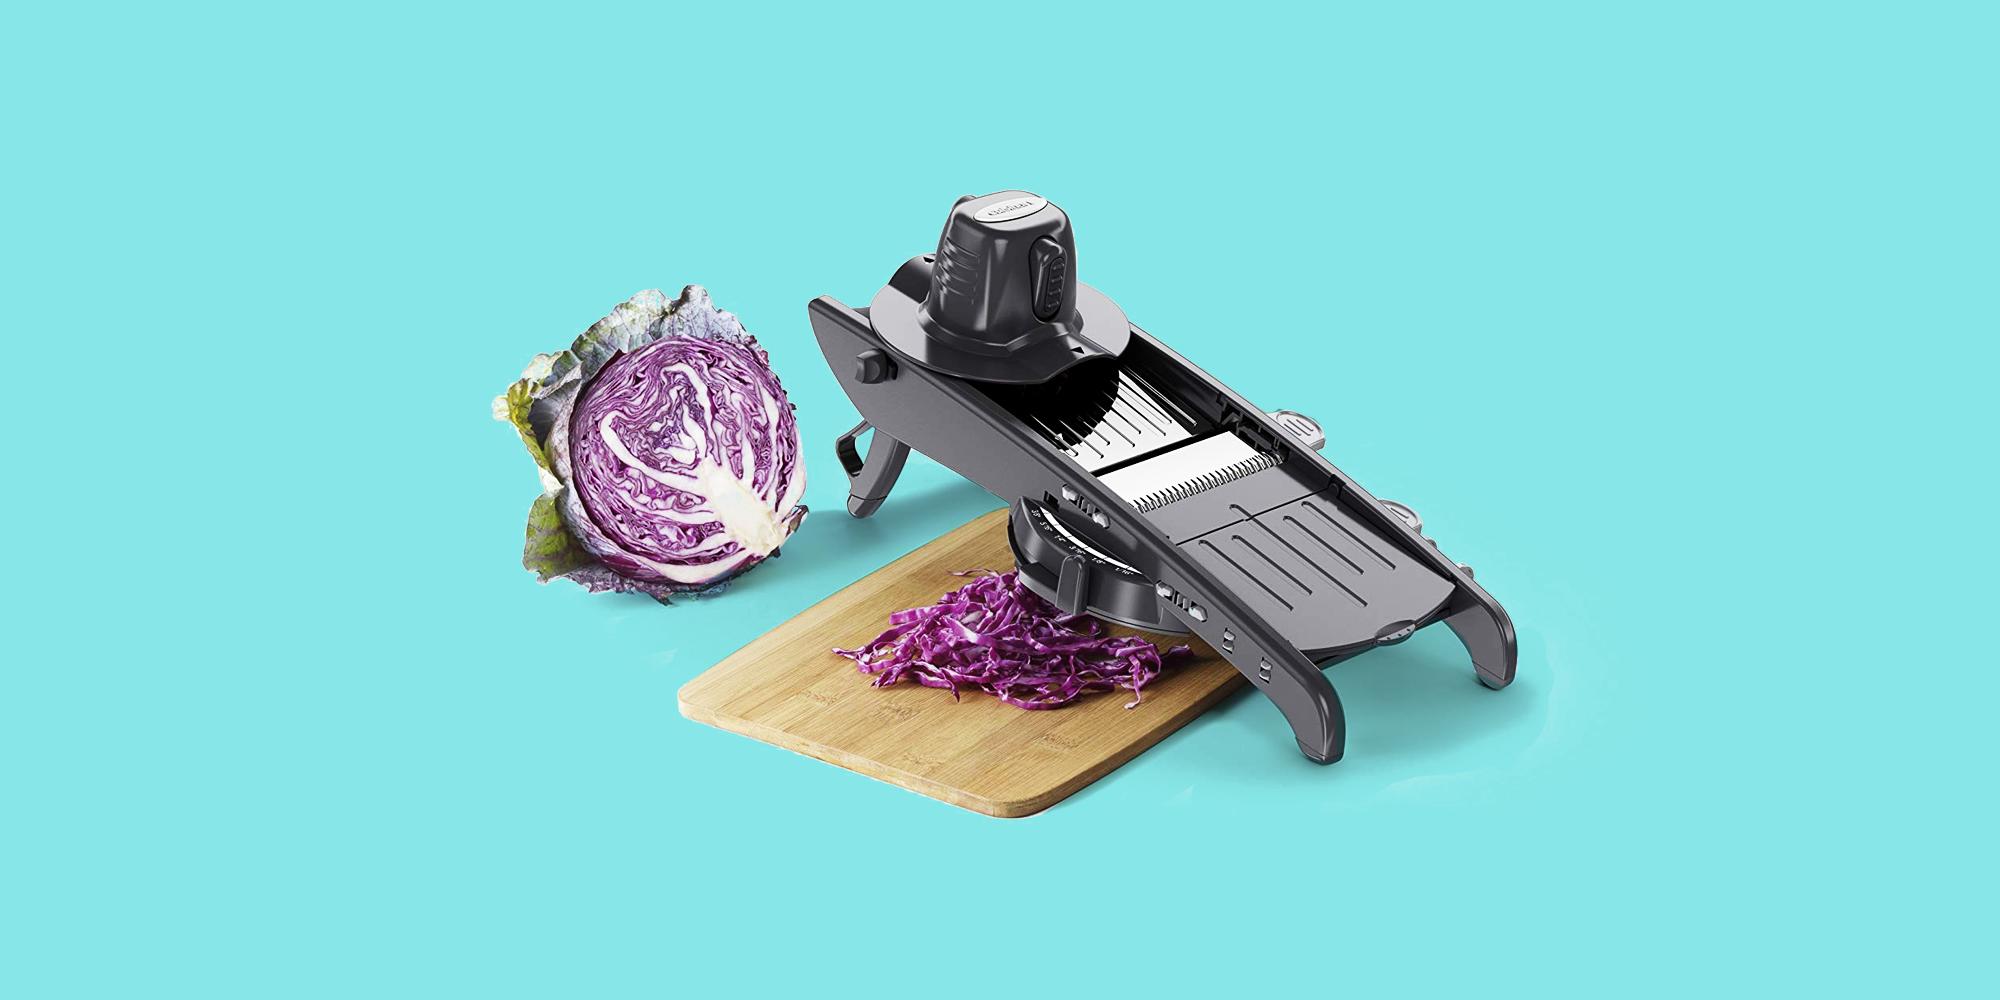 Chef/'n SleekSlice Folding Mandoline Slicer Chopper Kitchen Tool